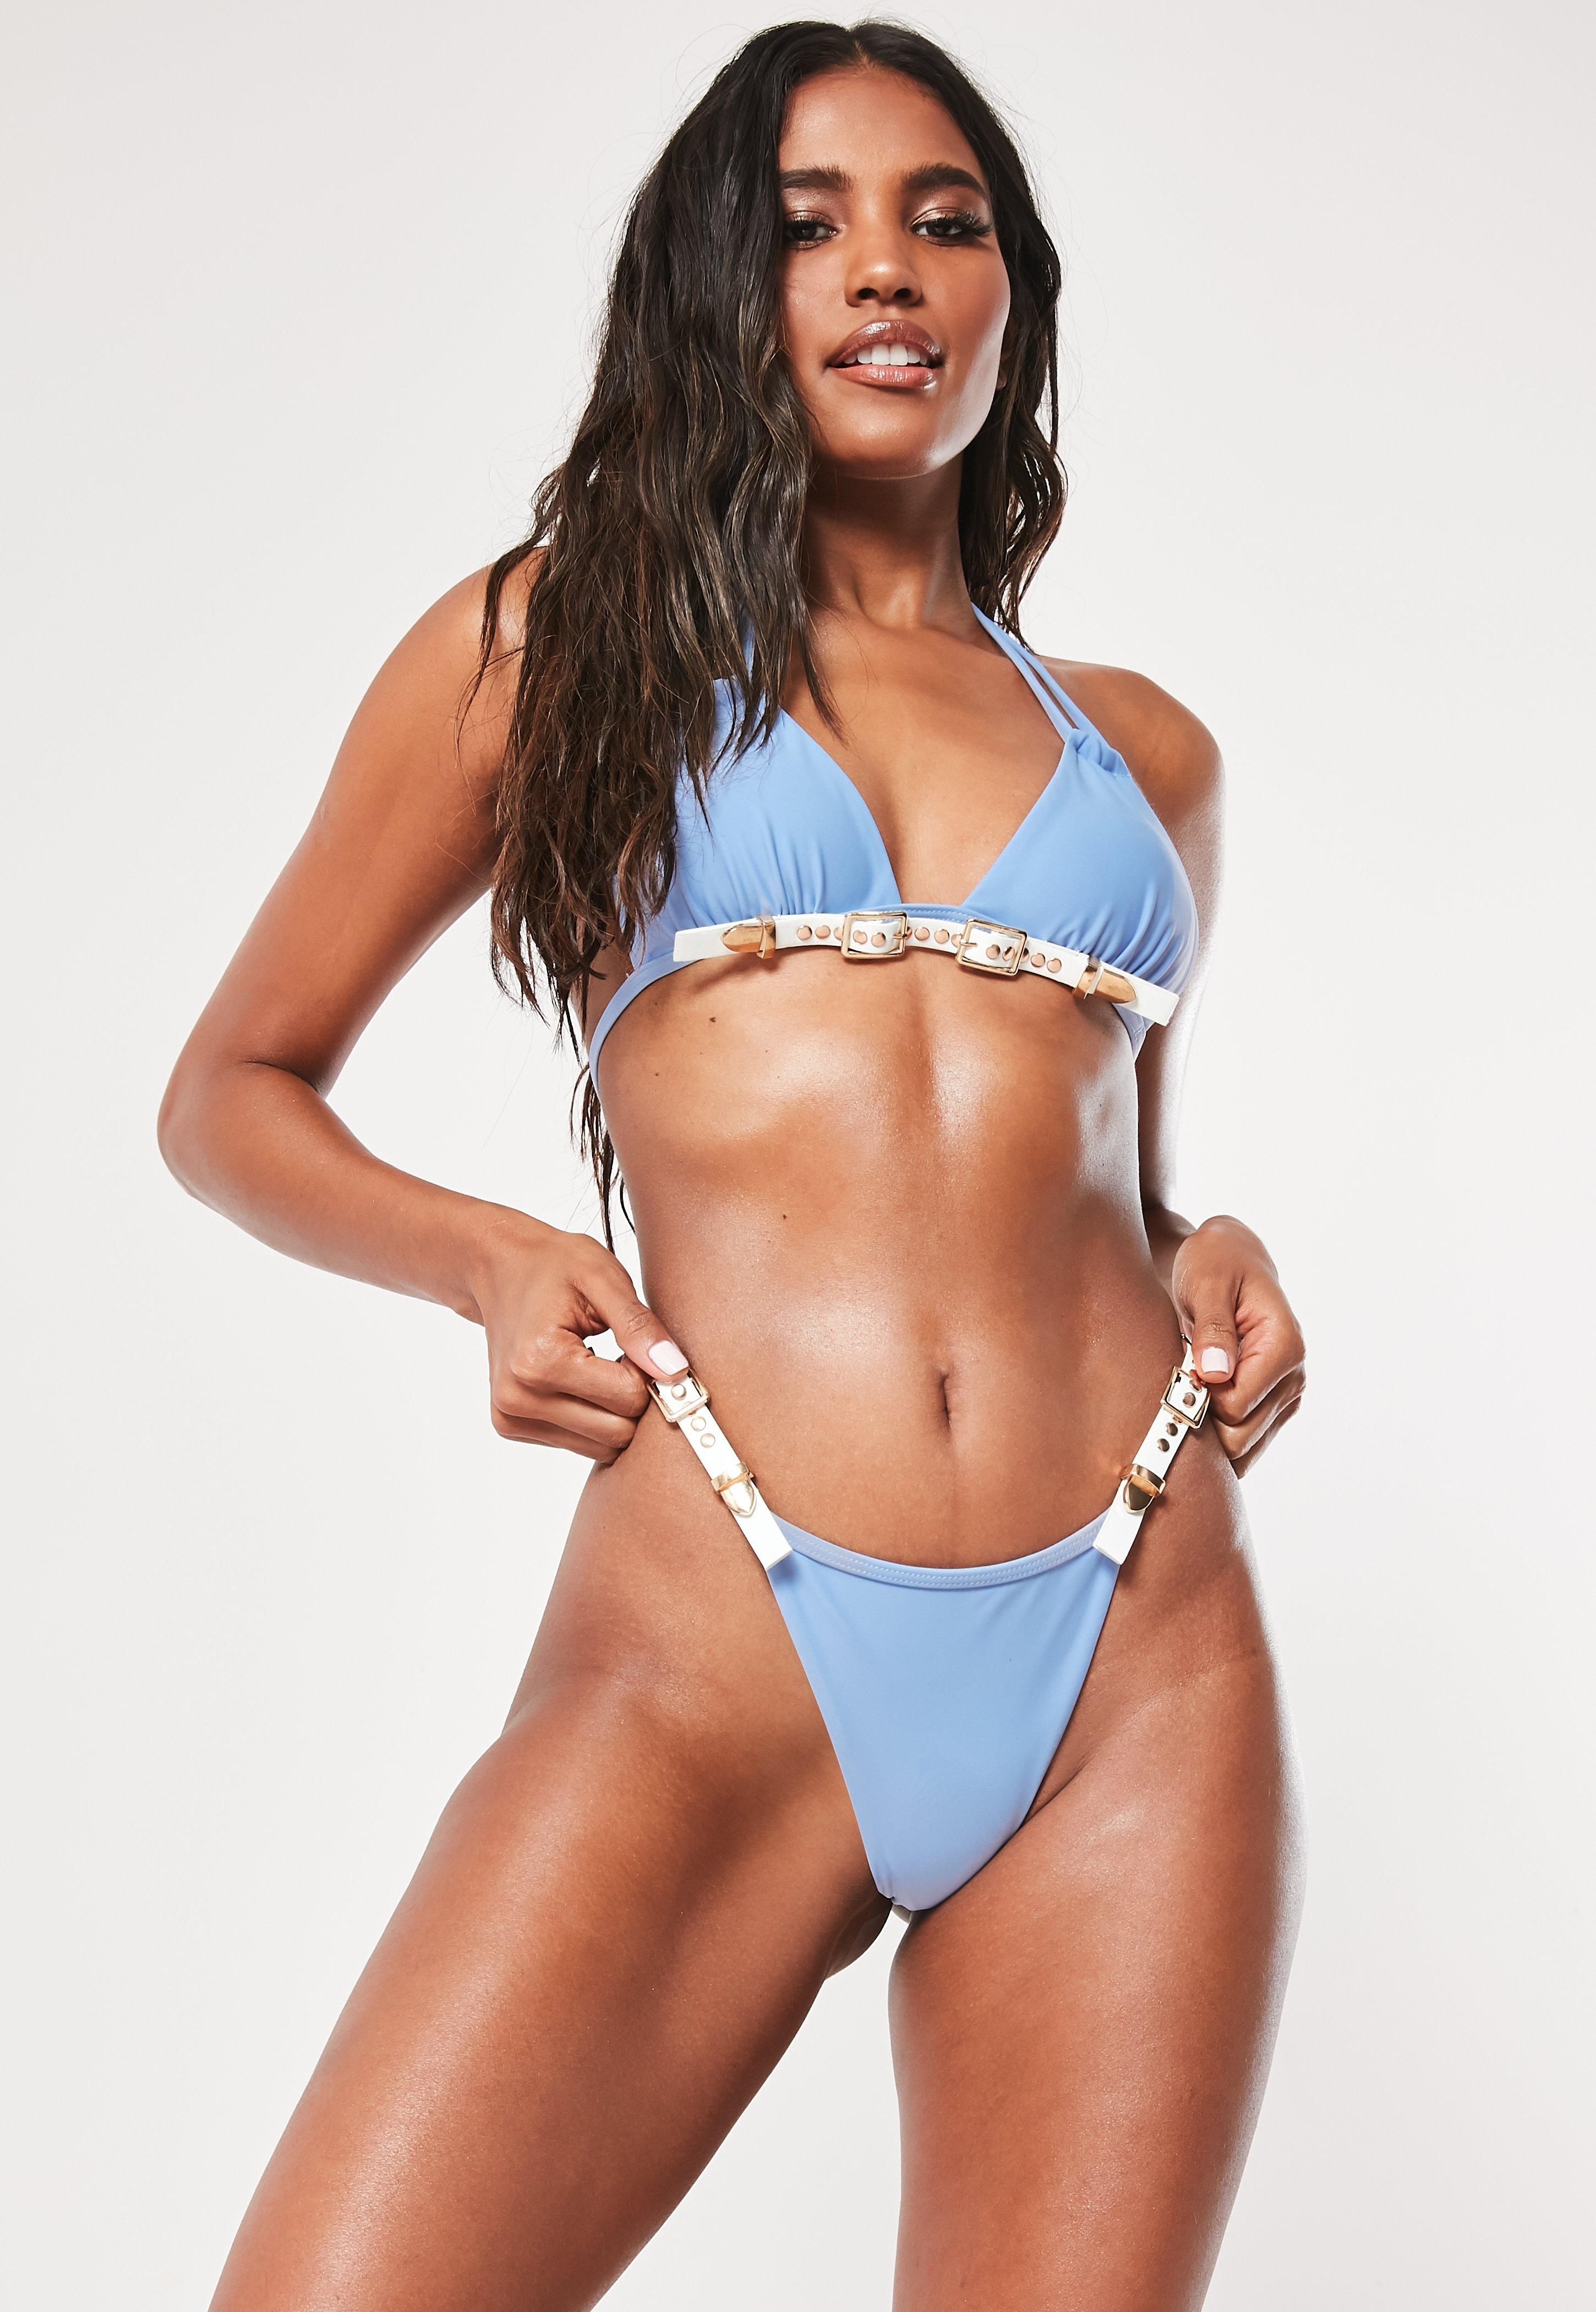 fdcacbe304716 Swimwear Sale - Swimsuits & Bikini Sale Upto 60% - Missguided